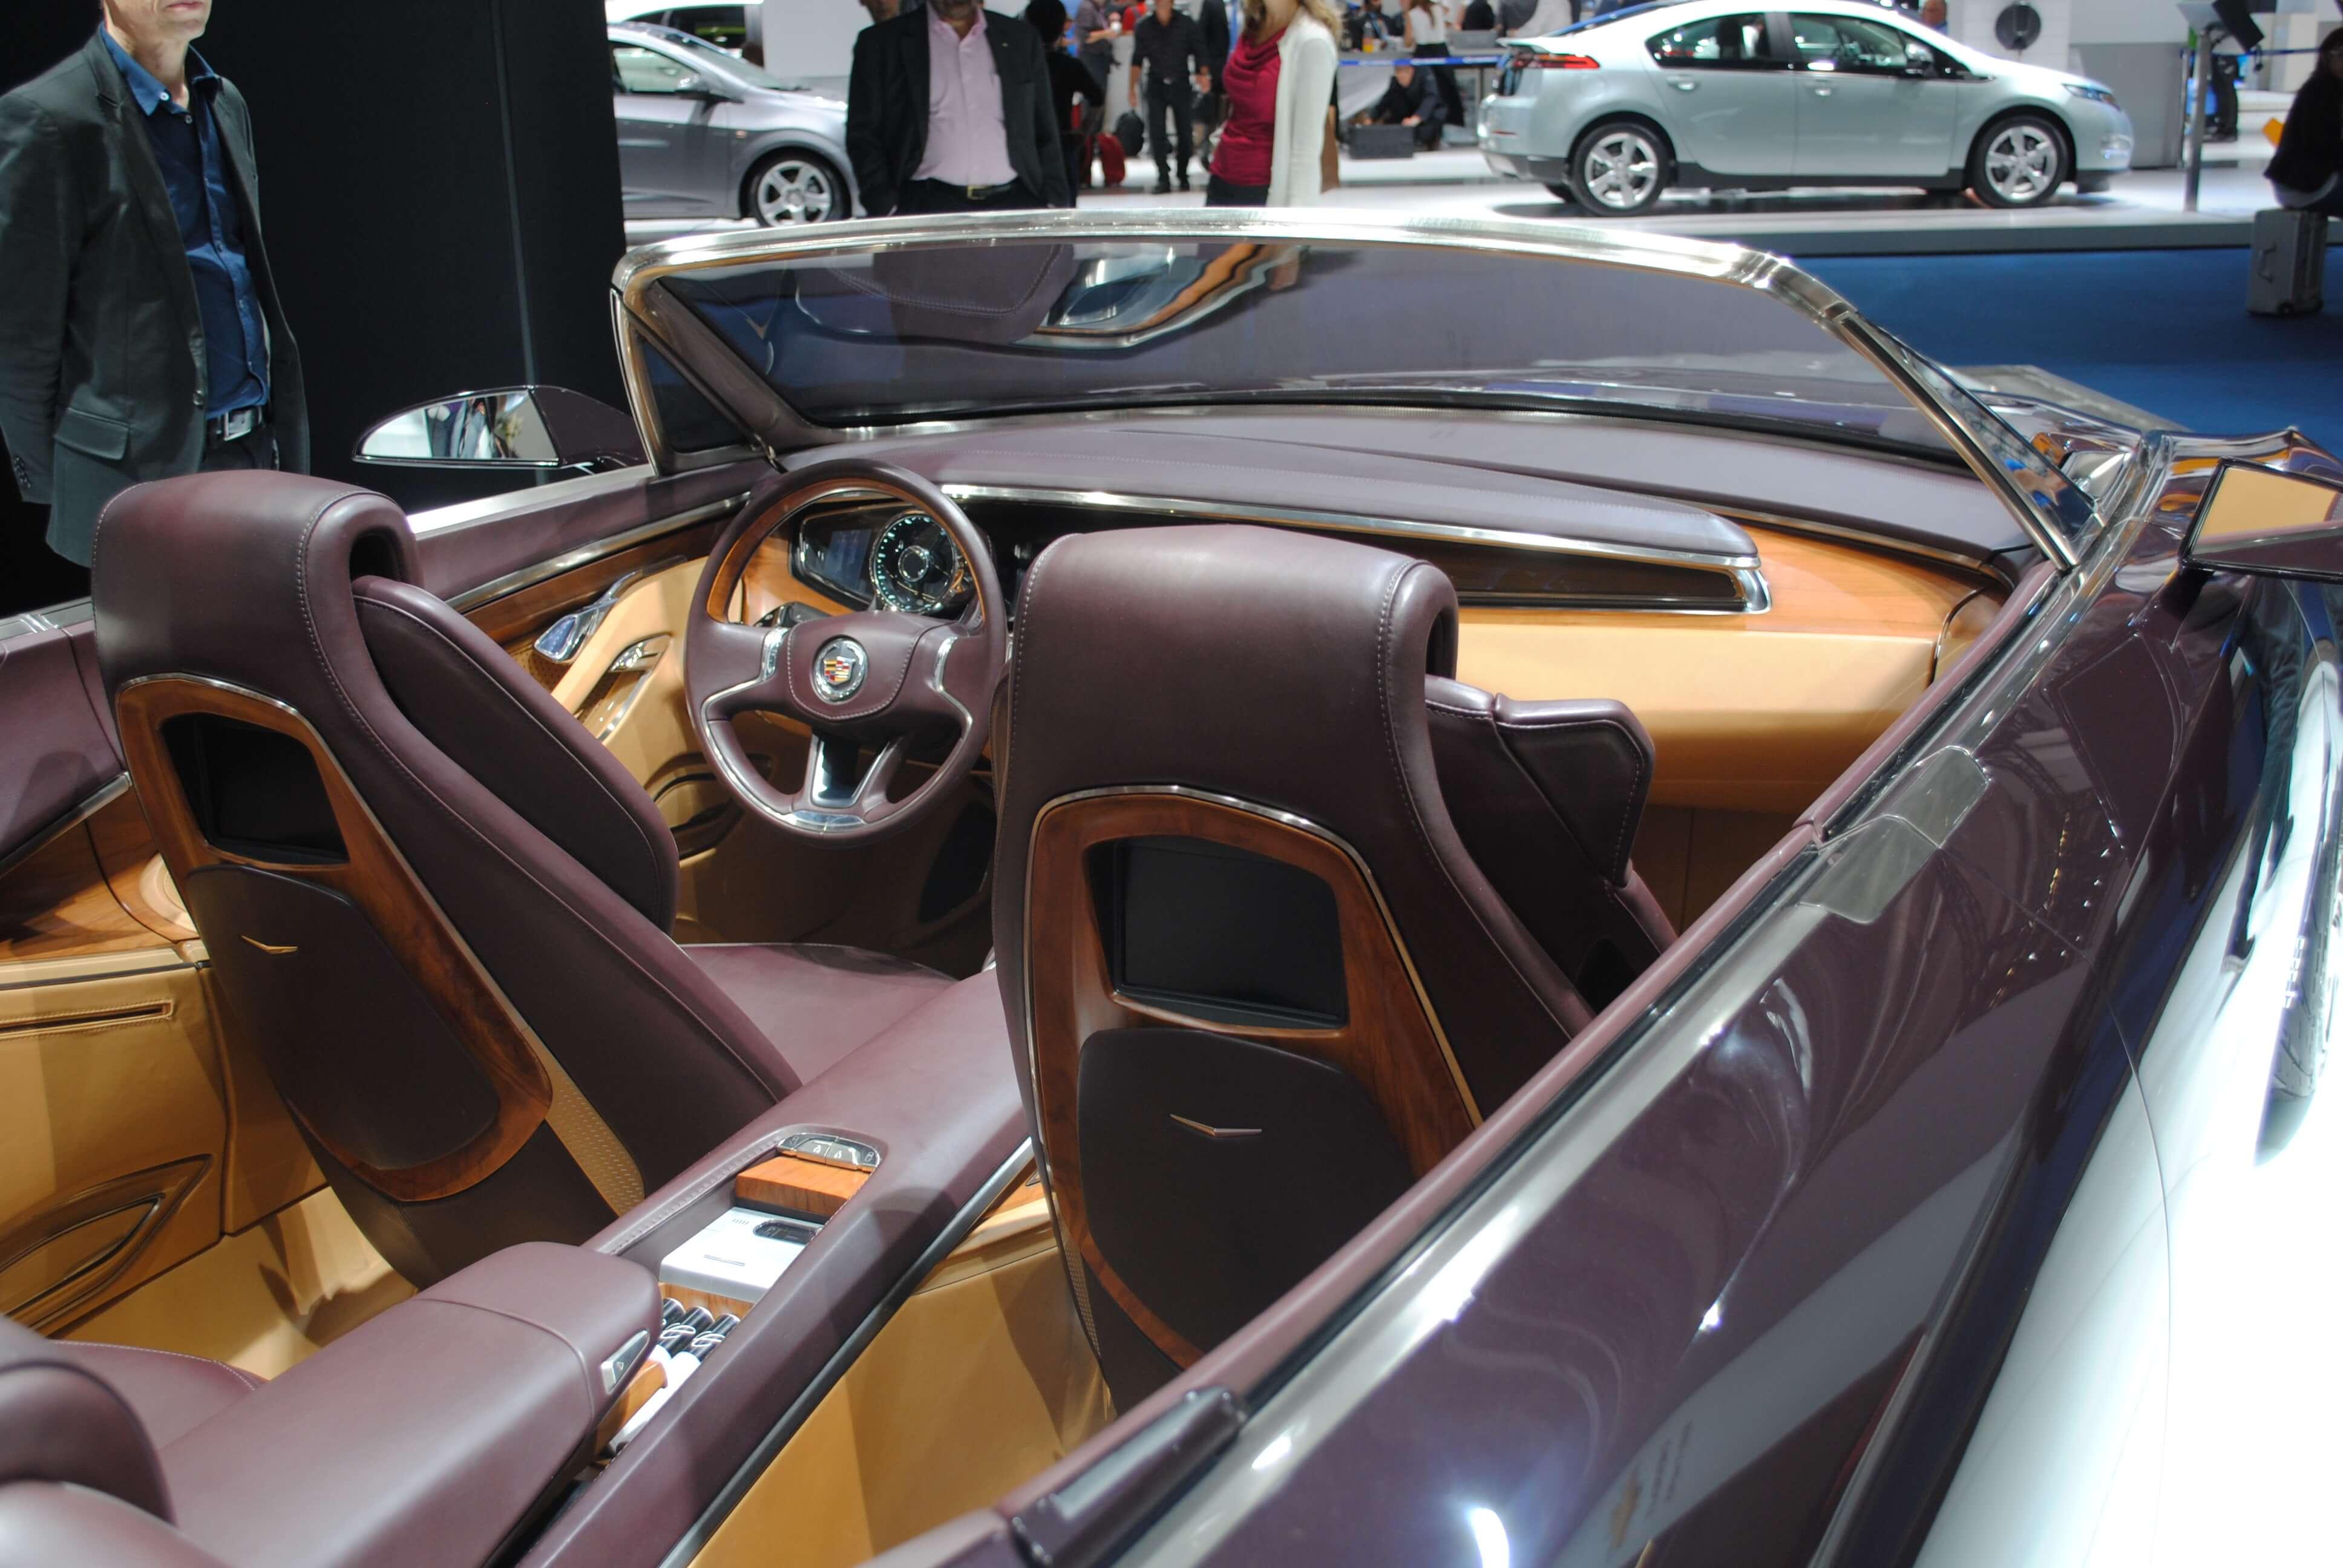 42 New 2020 Cadillac Convertible Concept with 2020 Cadillac Convertible